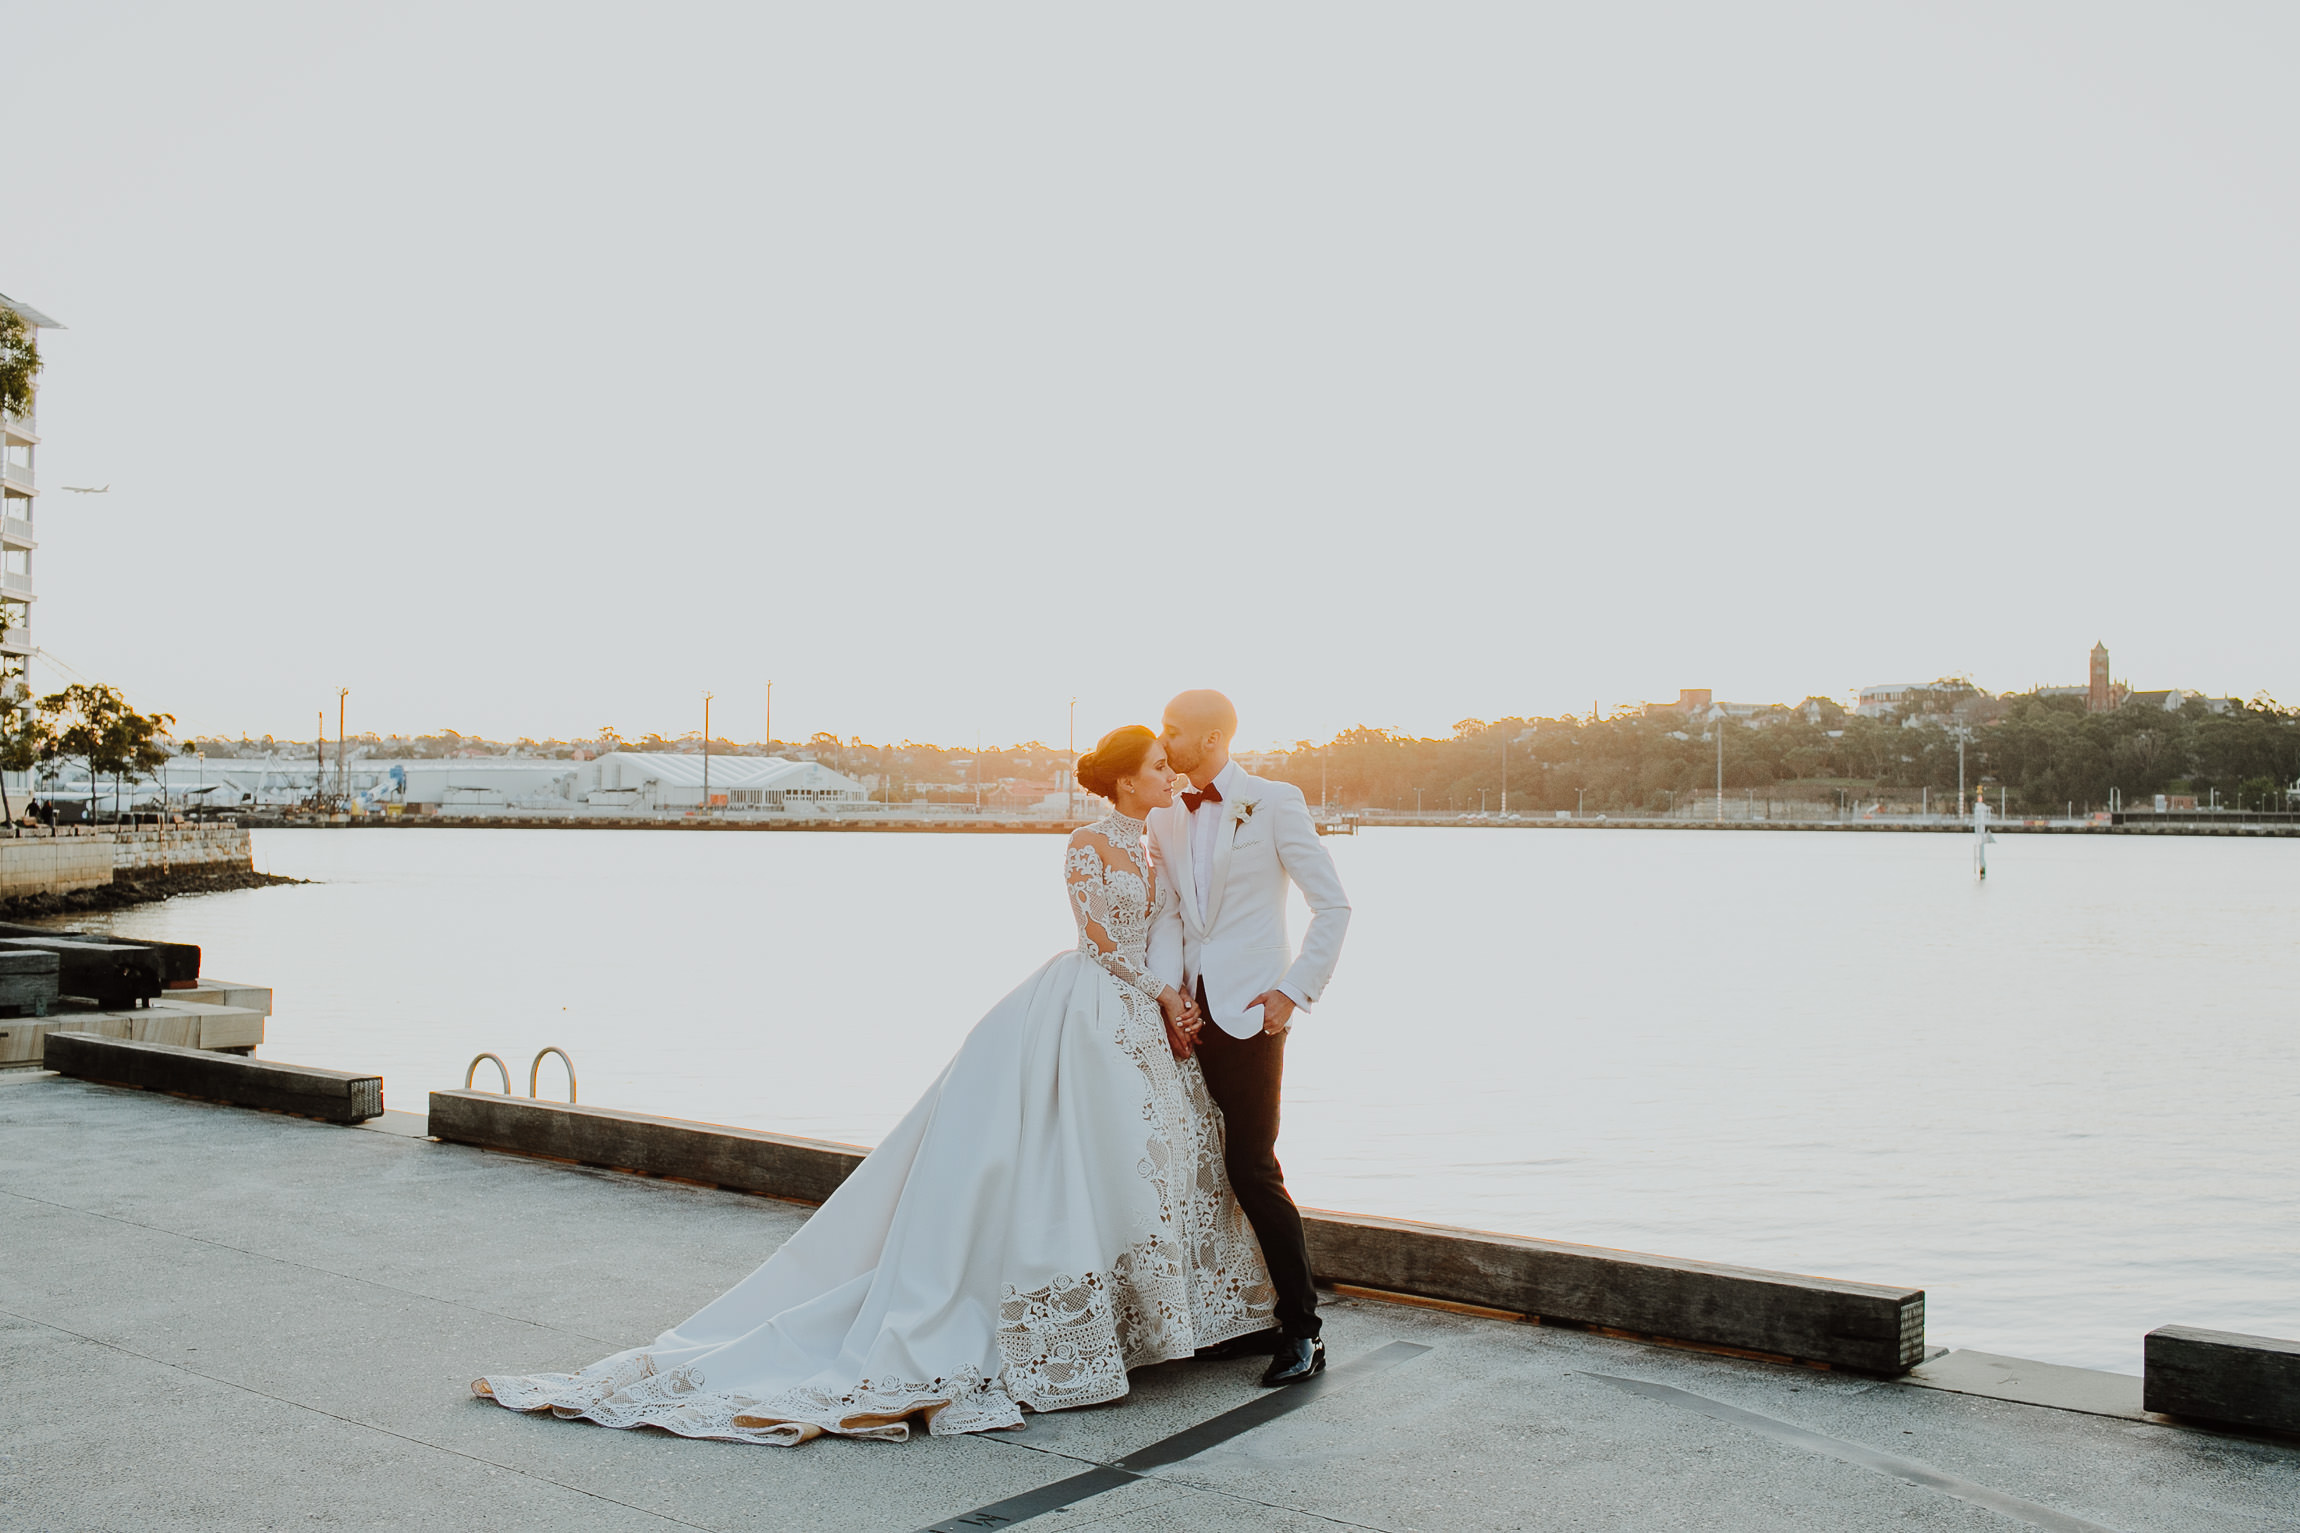 150623_justinaaron_wedding_bianca_ruben_pr-122.jpg